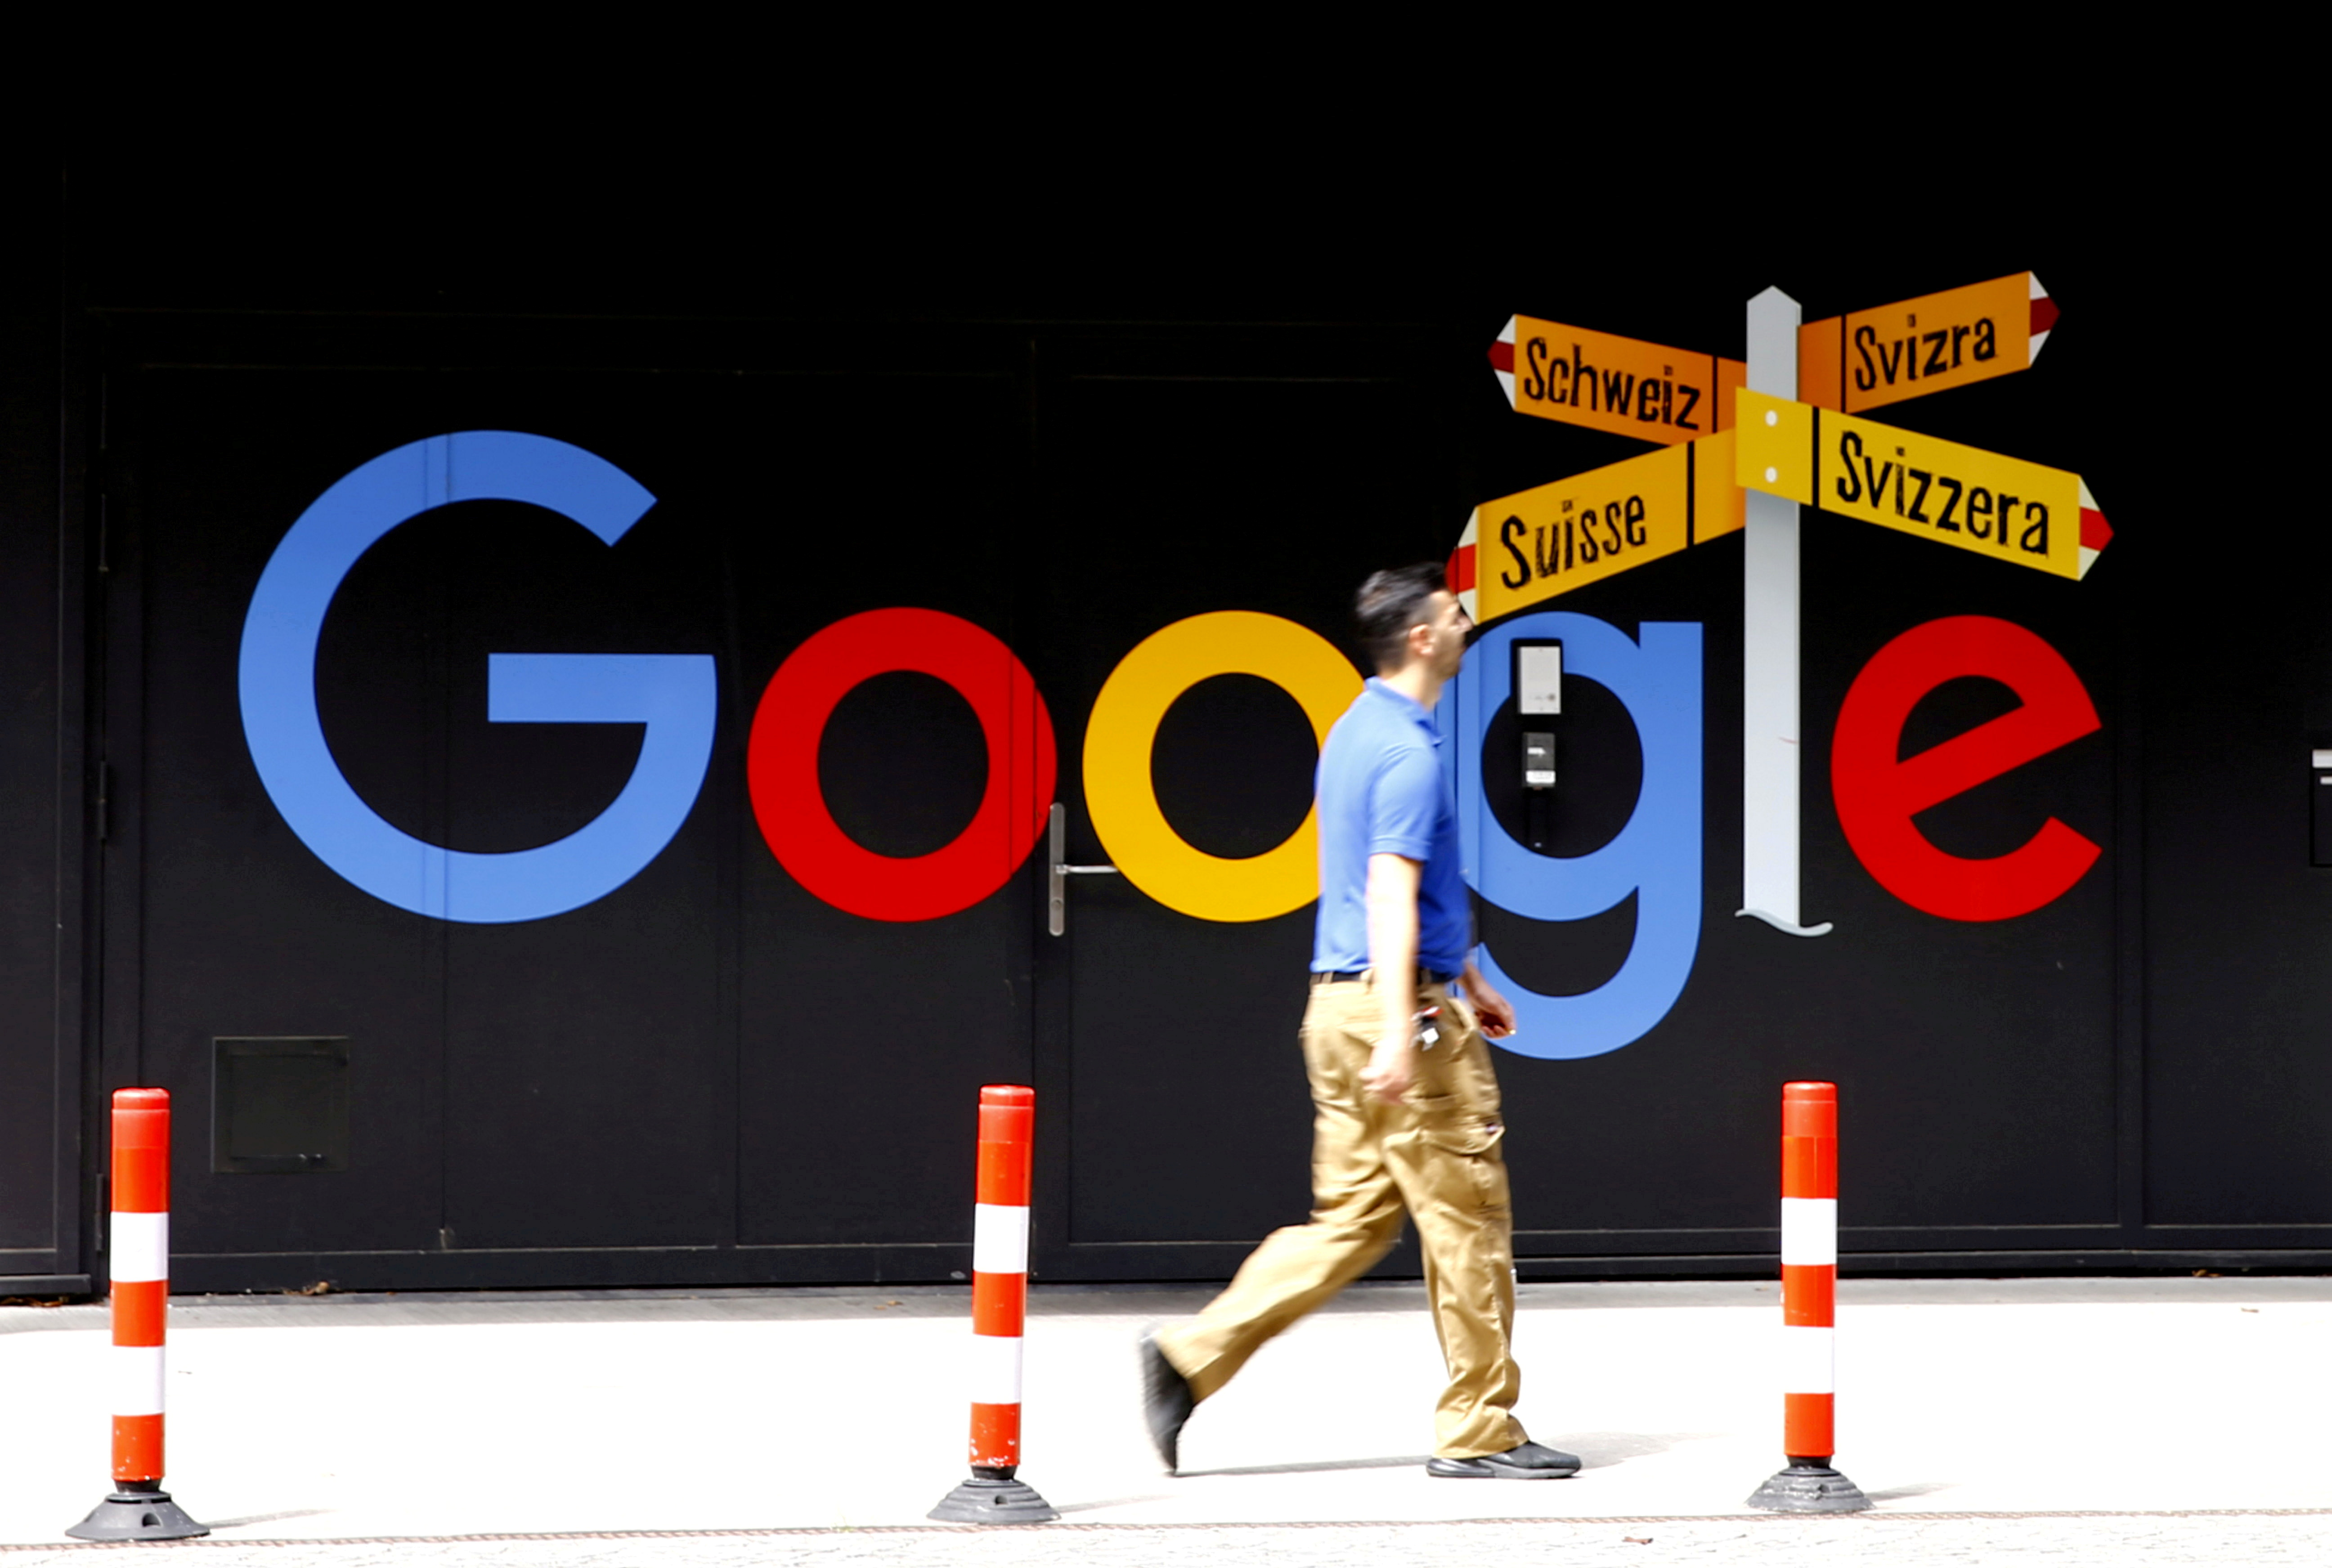 A man walks past a logo of Alphabet Inc's Google in front of at an office building in Zurich, Switzerland July 1, 2020. REUTERS/Arnd Wiegmann